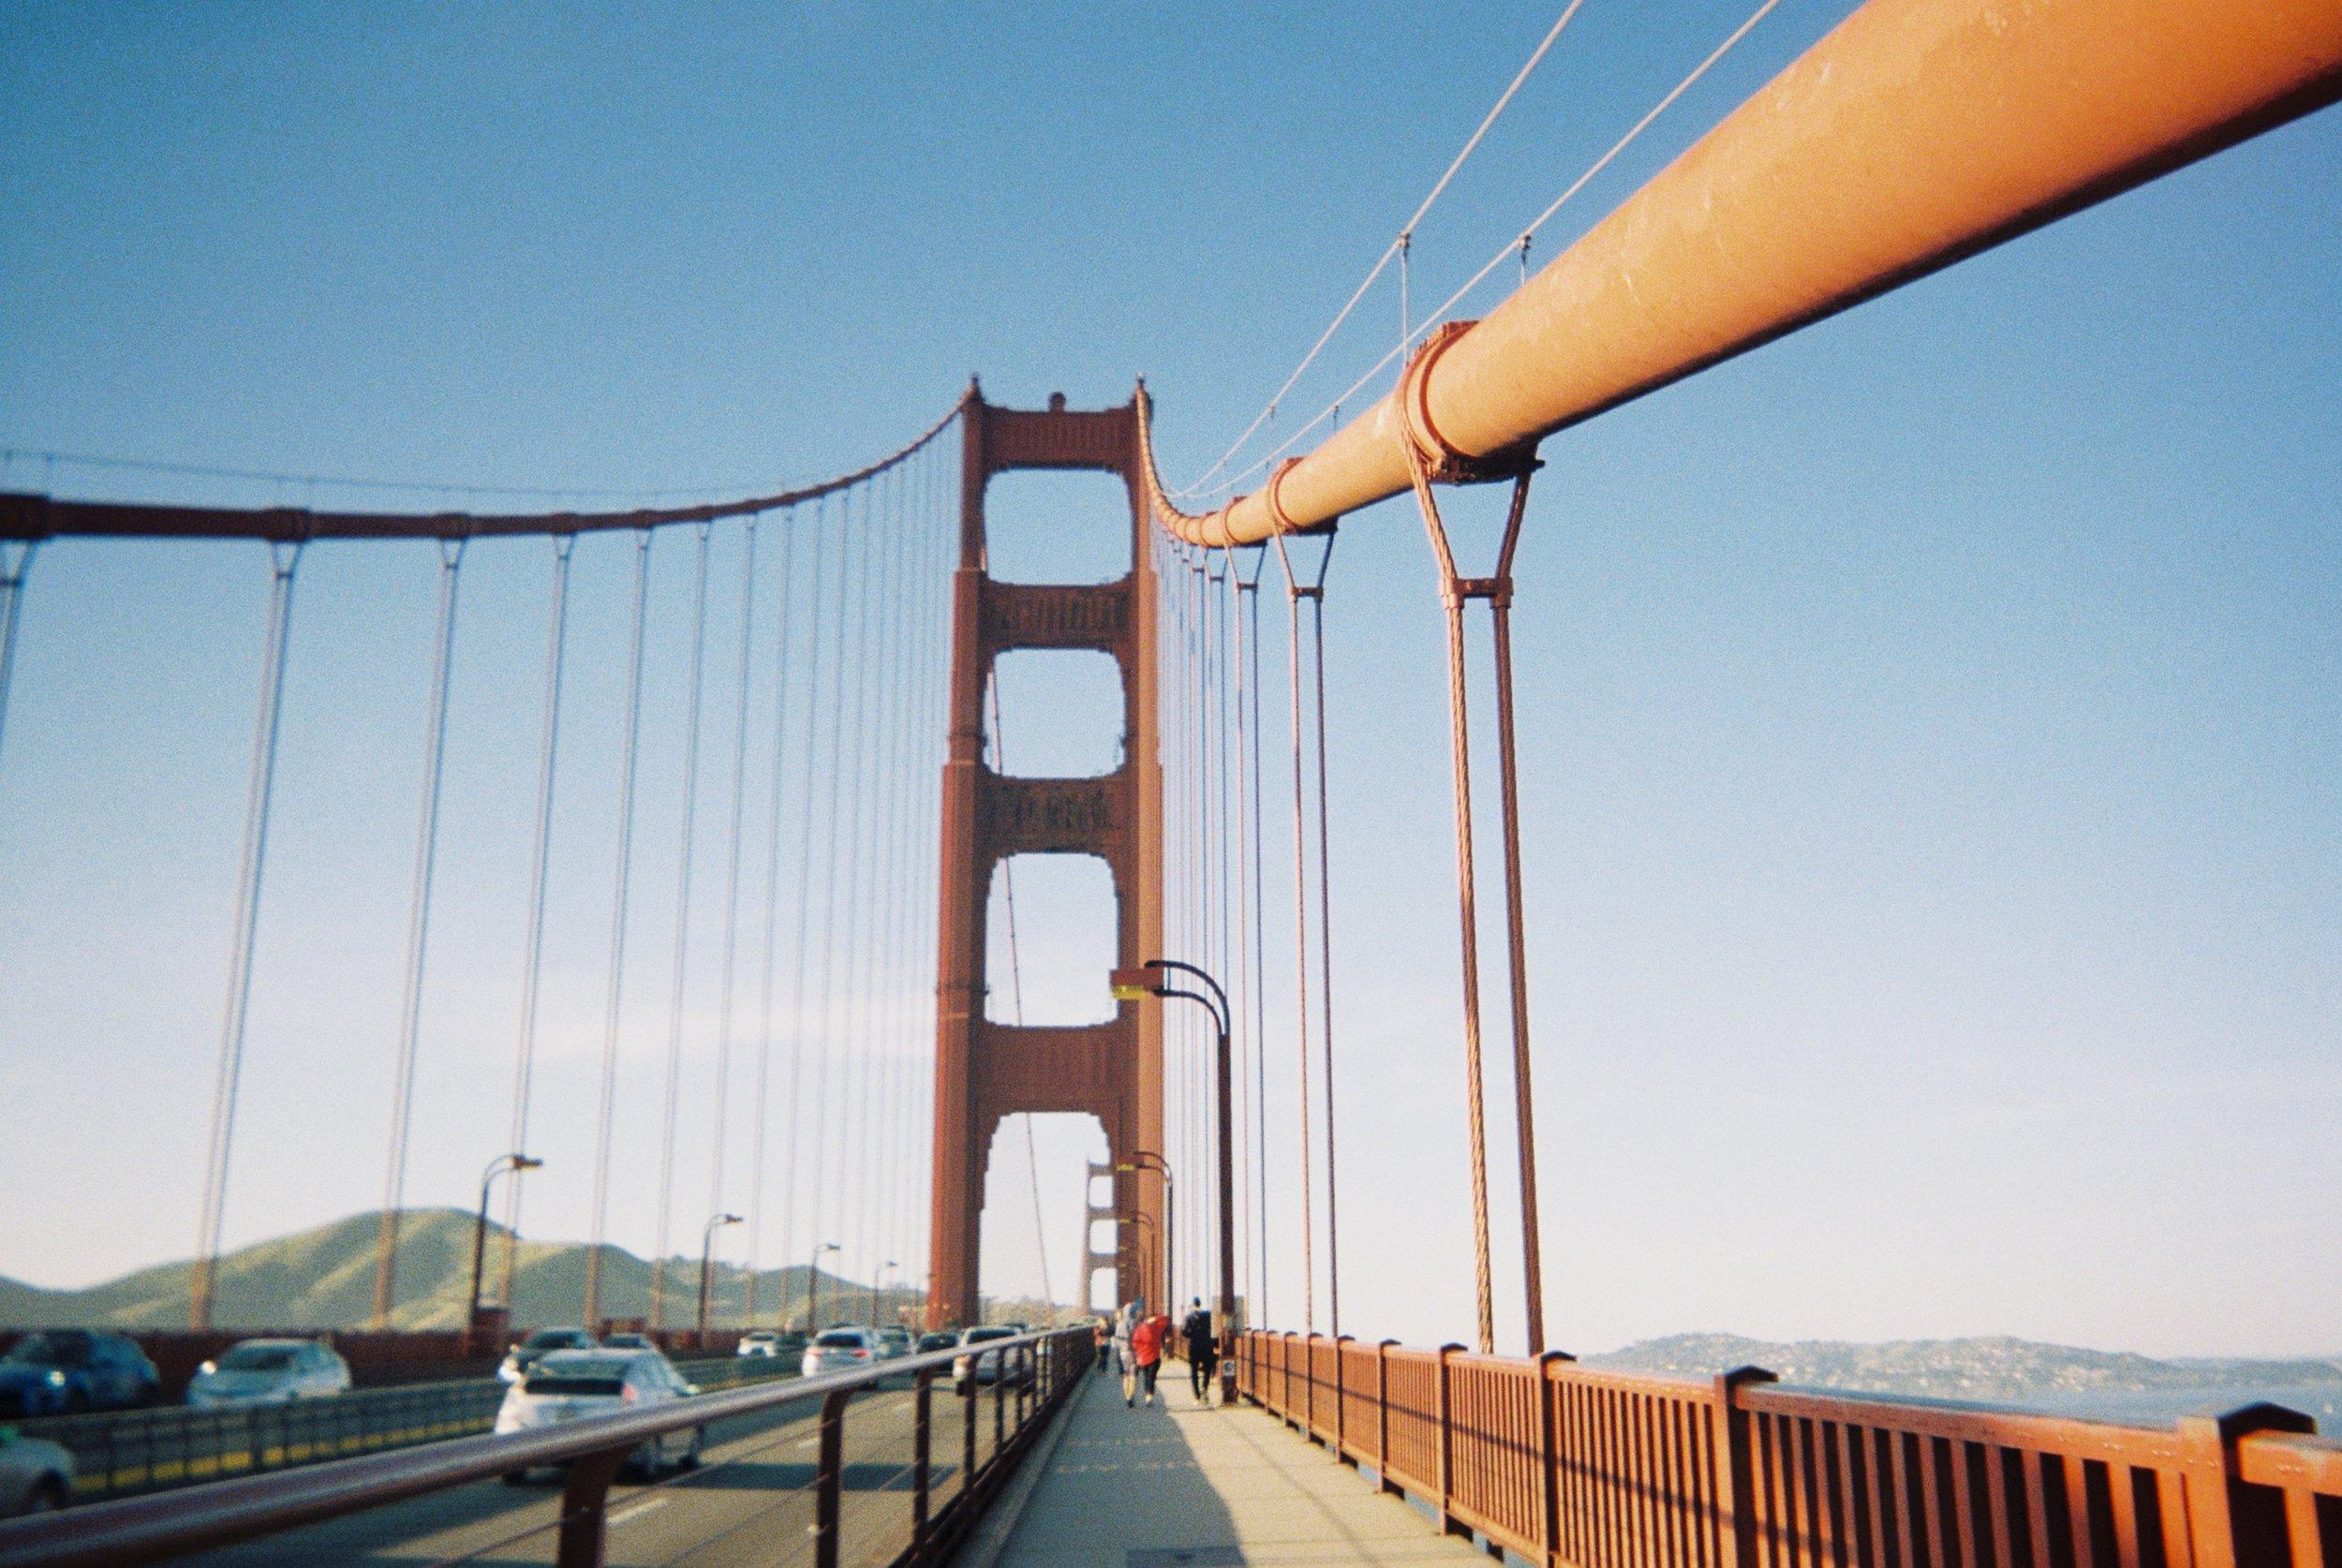 The Golden Gate Bridge I San Fransicso, California